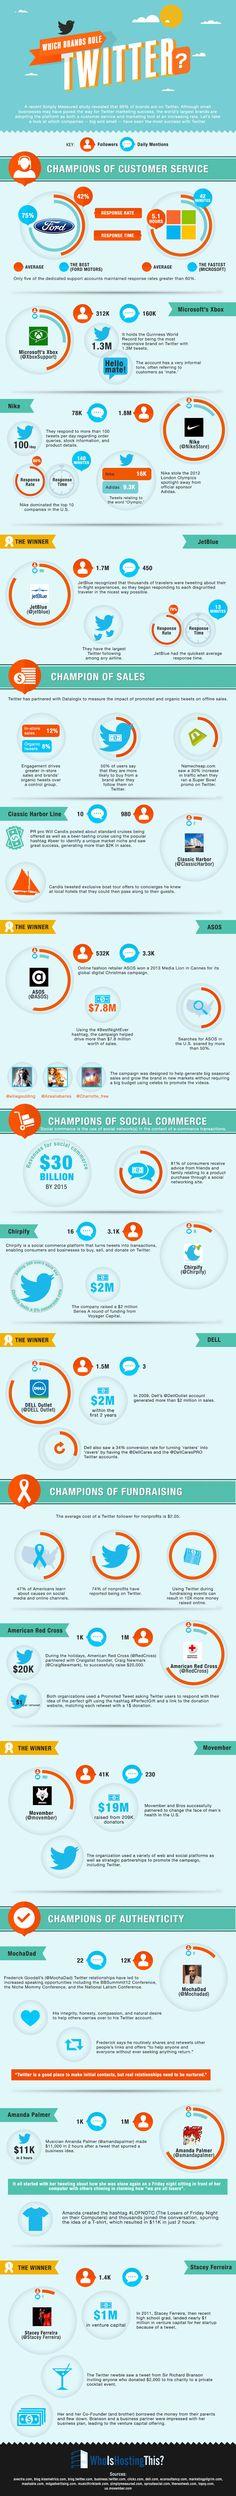 Which brands are performing best on Twitter #Infographic >> Que empresas tienen mejor presencia en Twitter